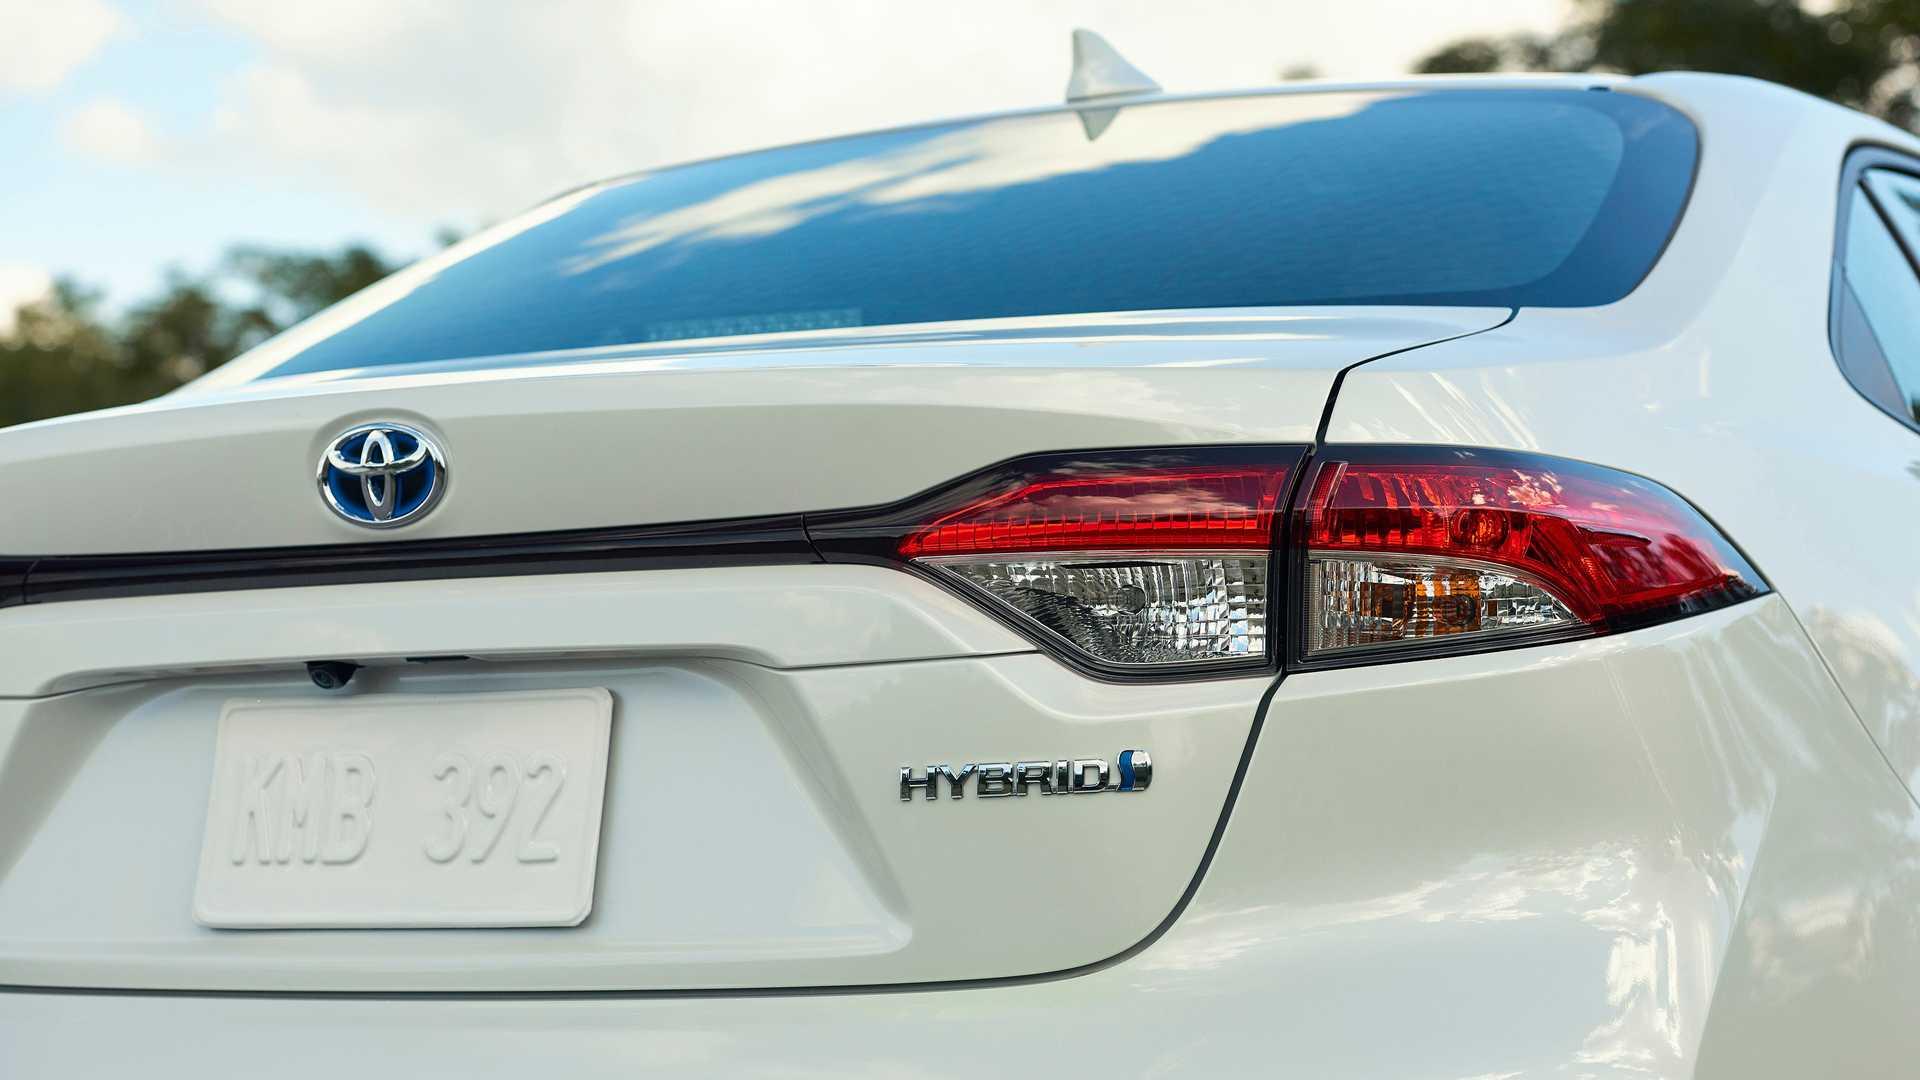 2020-toyota-corolla-hybrid-usa (1).jpg